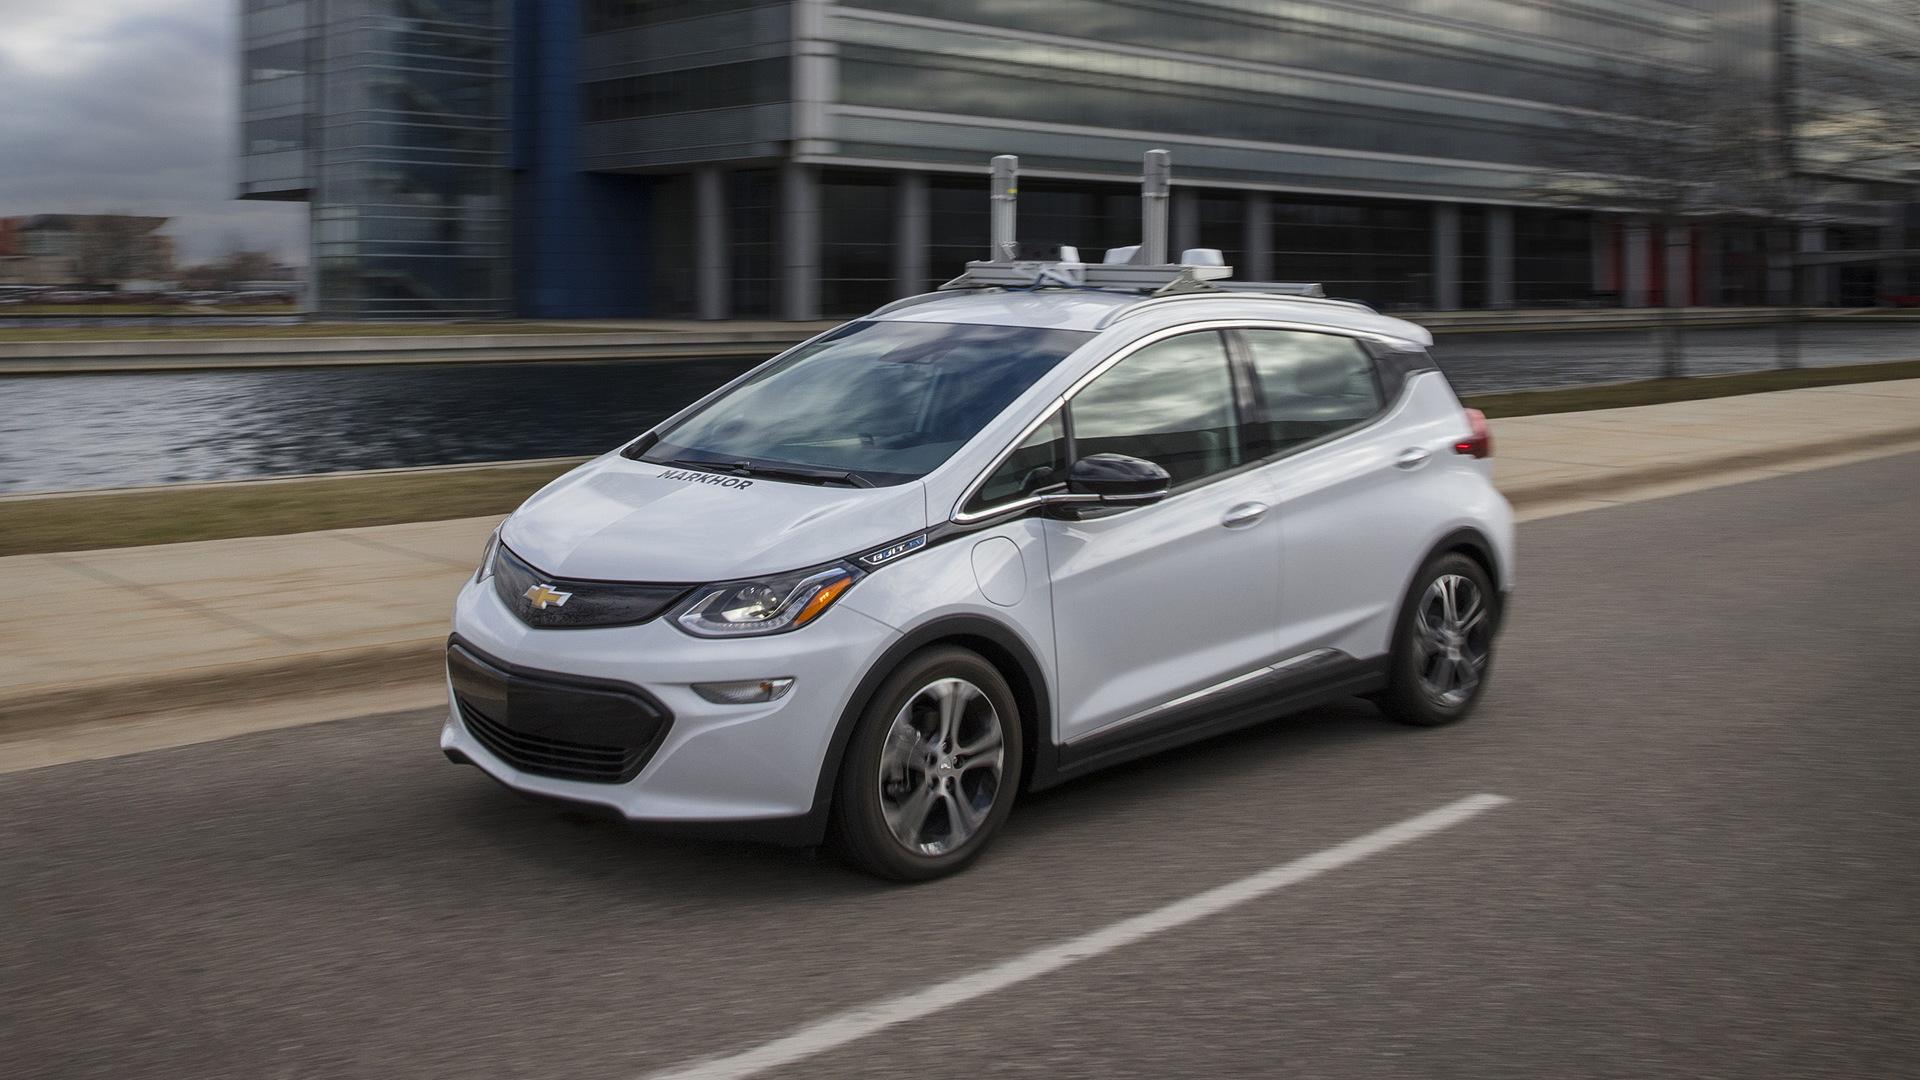 Chevrolet Bolt EV self-driving prototype